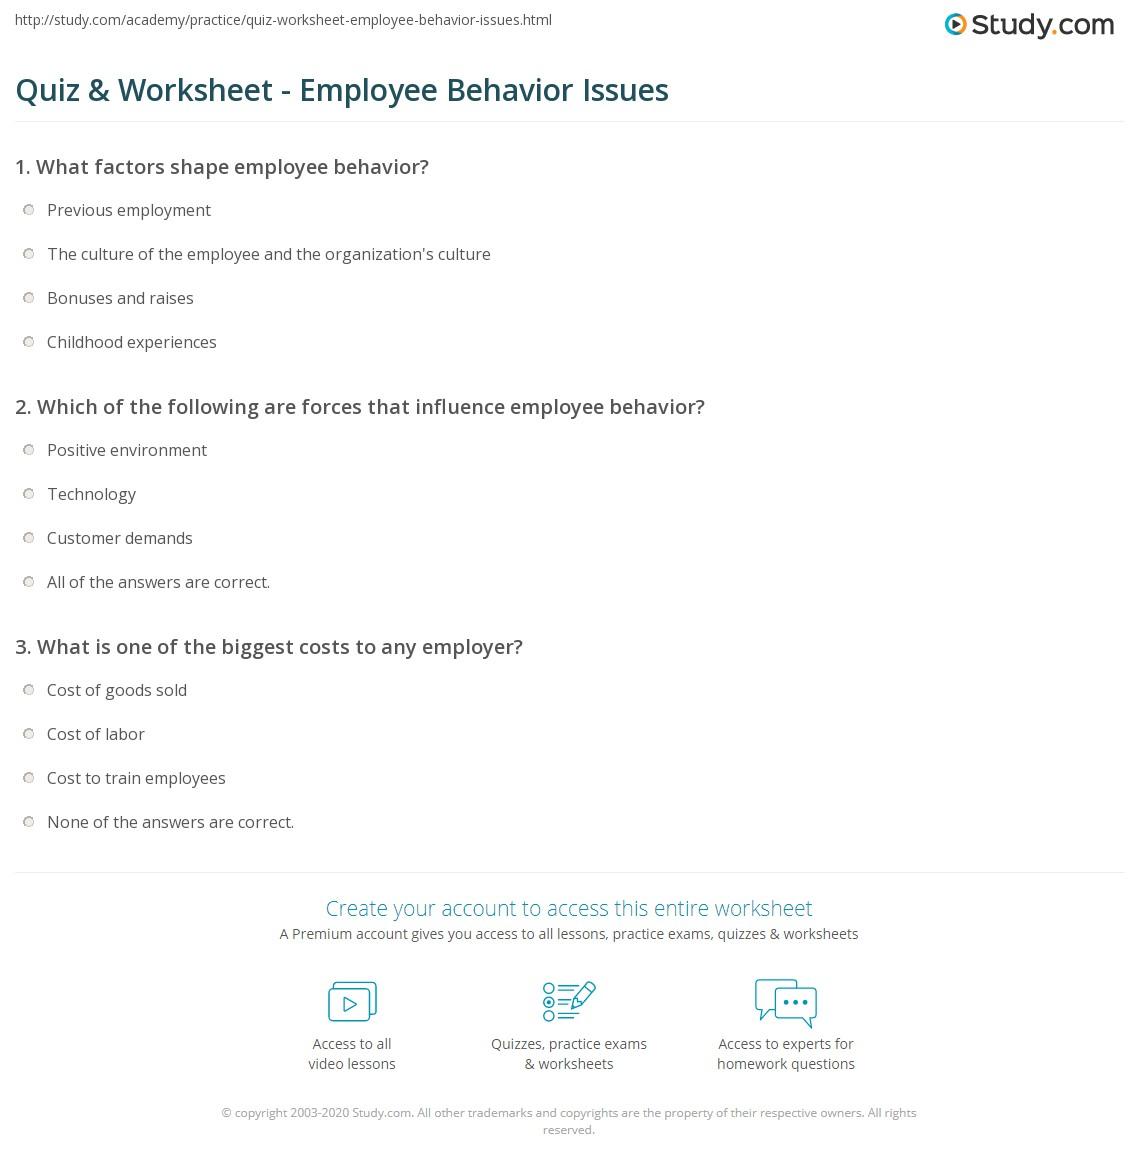 quiz worksheet employee behavior issues com print employee behavior definition issues expectations worksheet